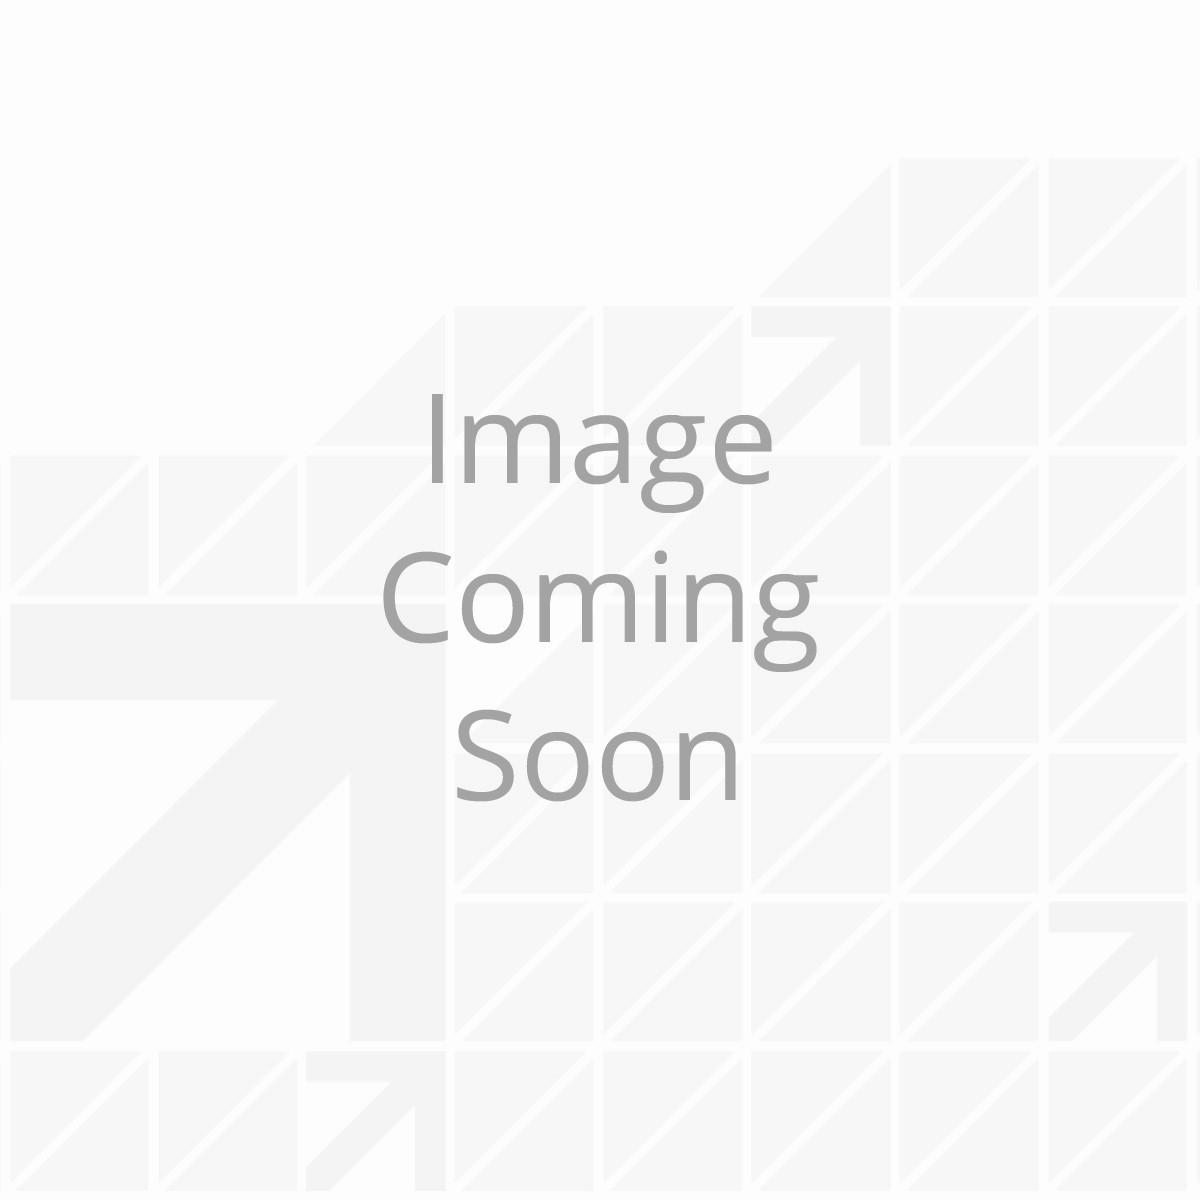 5121 ALPHATHANE 100% Solids Self-Leveling Sealant, Almond (9.8 Oz. Tube)